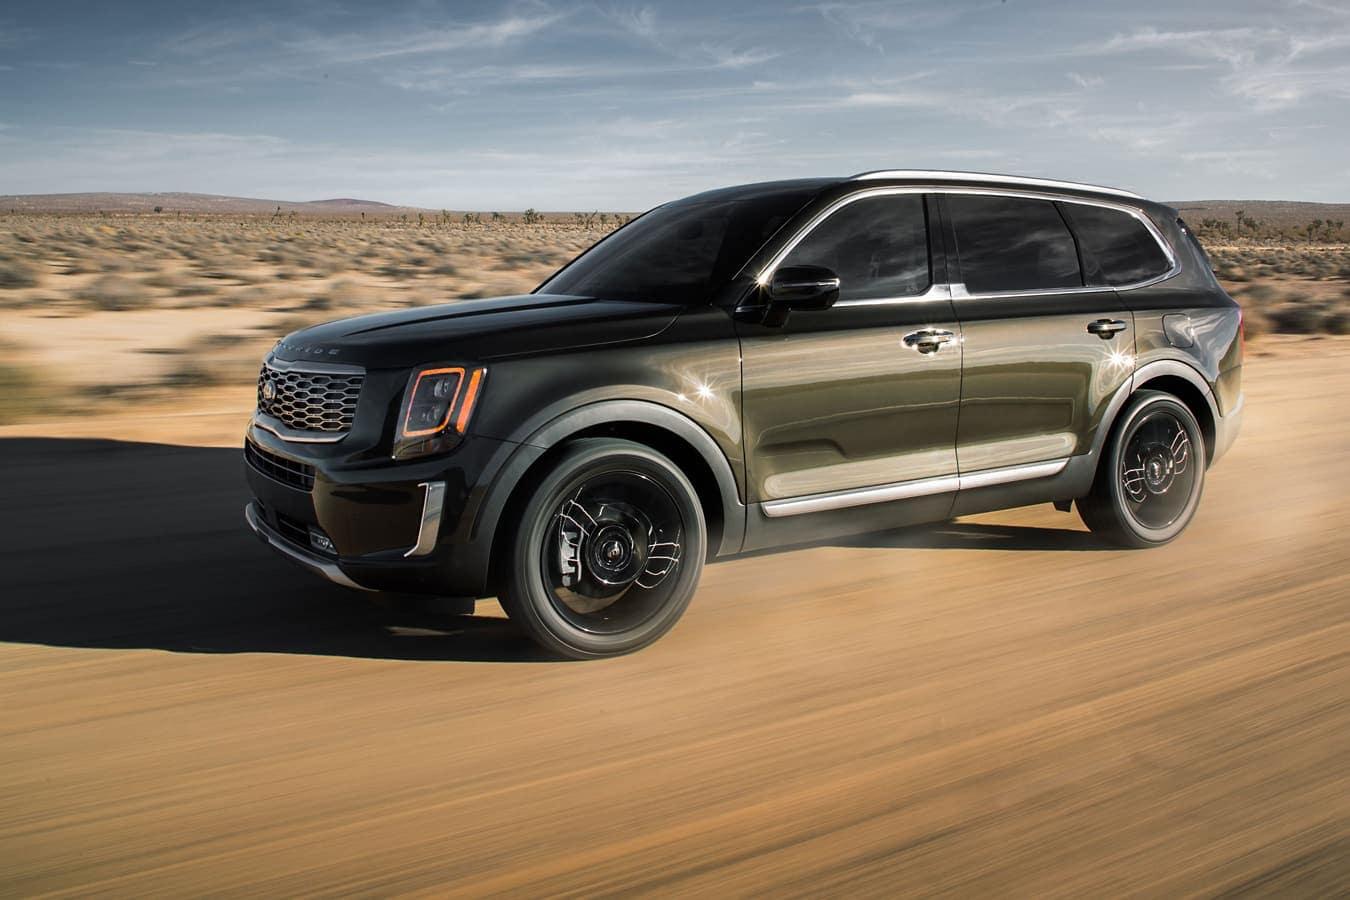 Detroit News - 2020 Kia Telluride MotorTrend's 2020 SUV of the Year